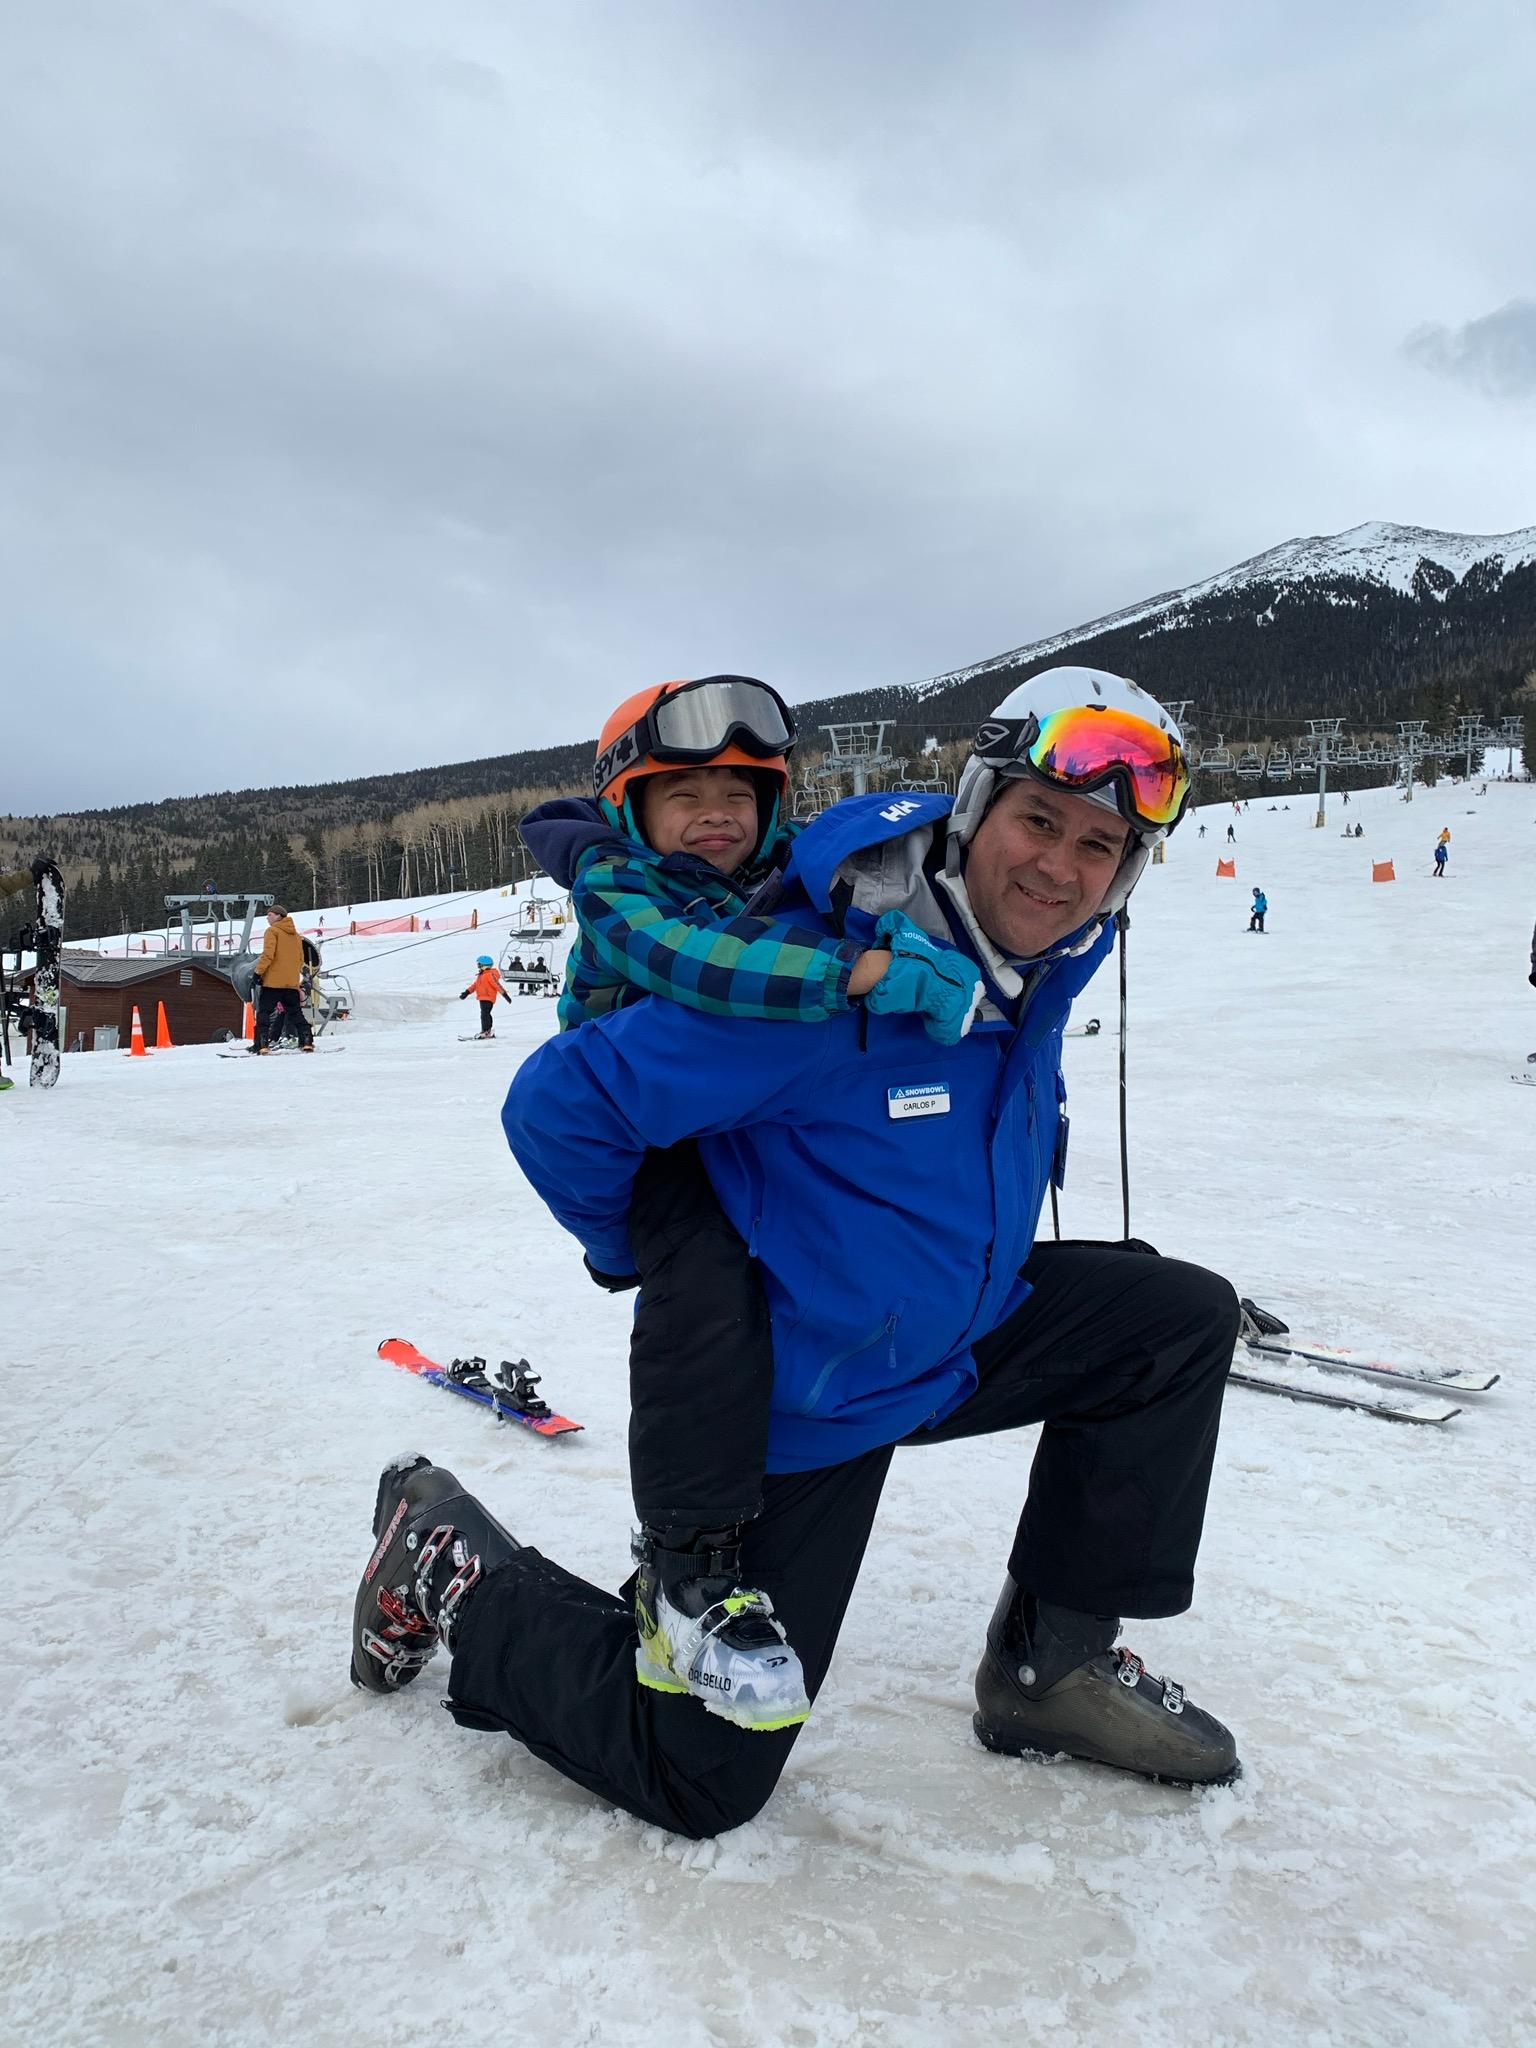 Ski Instructor Carlos Petersen